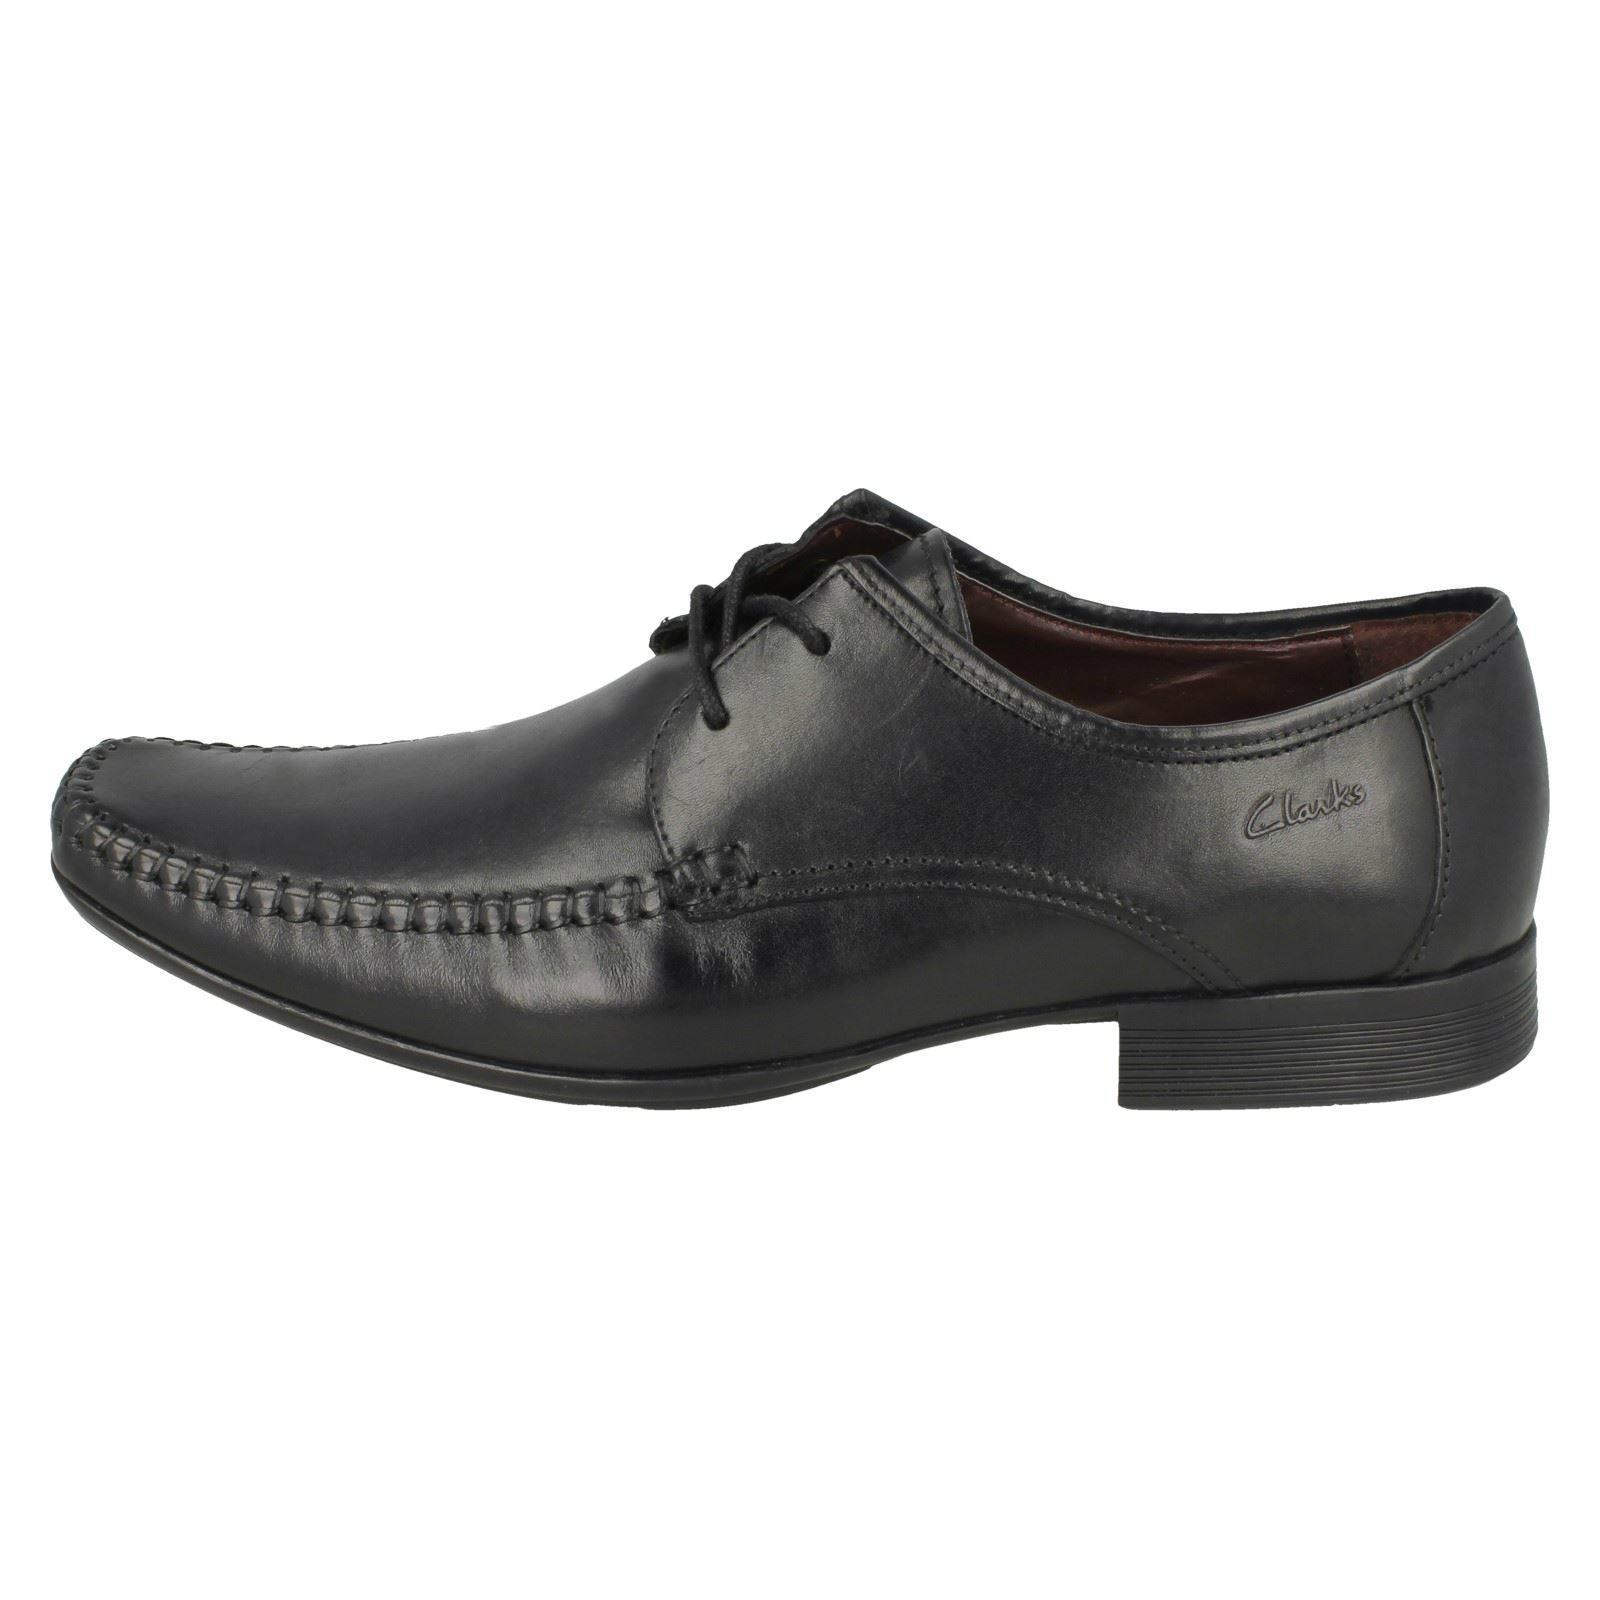 Clarks Clarks Hommes Habill Hommes Chaussures Habill Chaussures Habill Hommes Clarks Clarks Chaussures Hommes qE5vxHnA